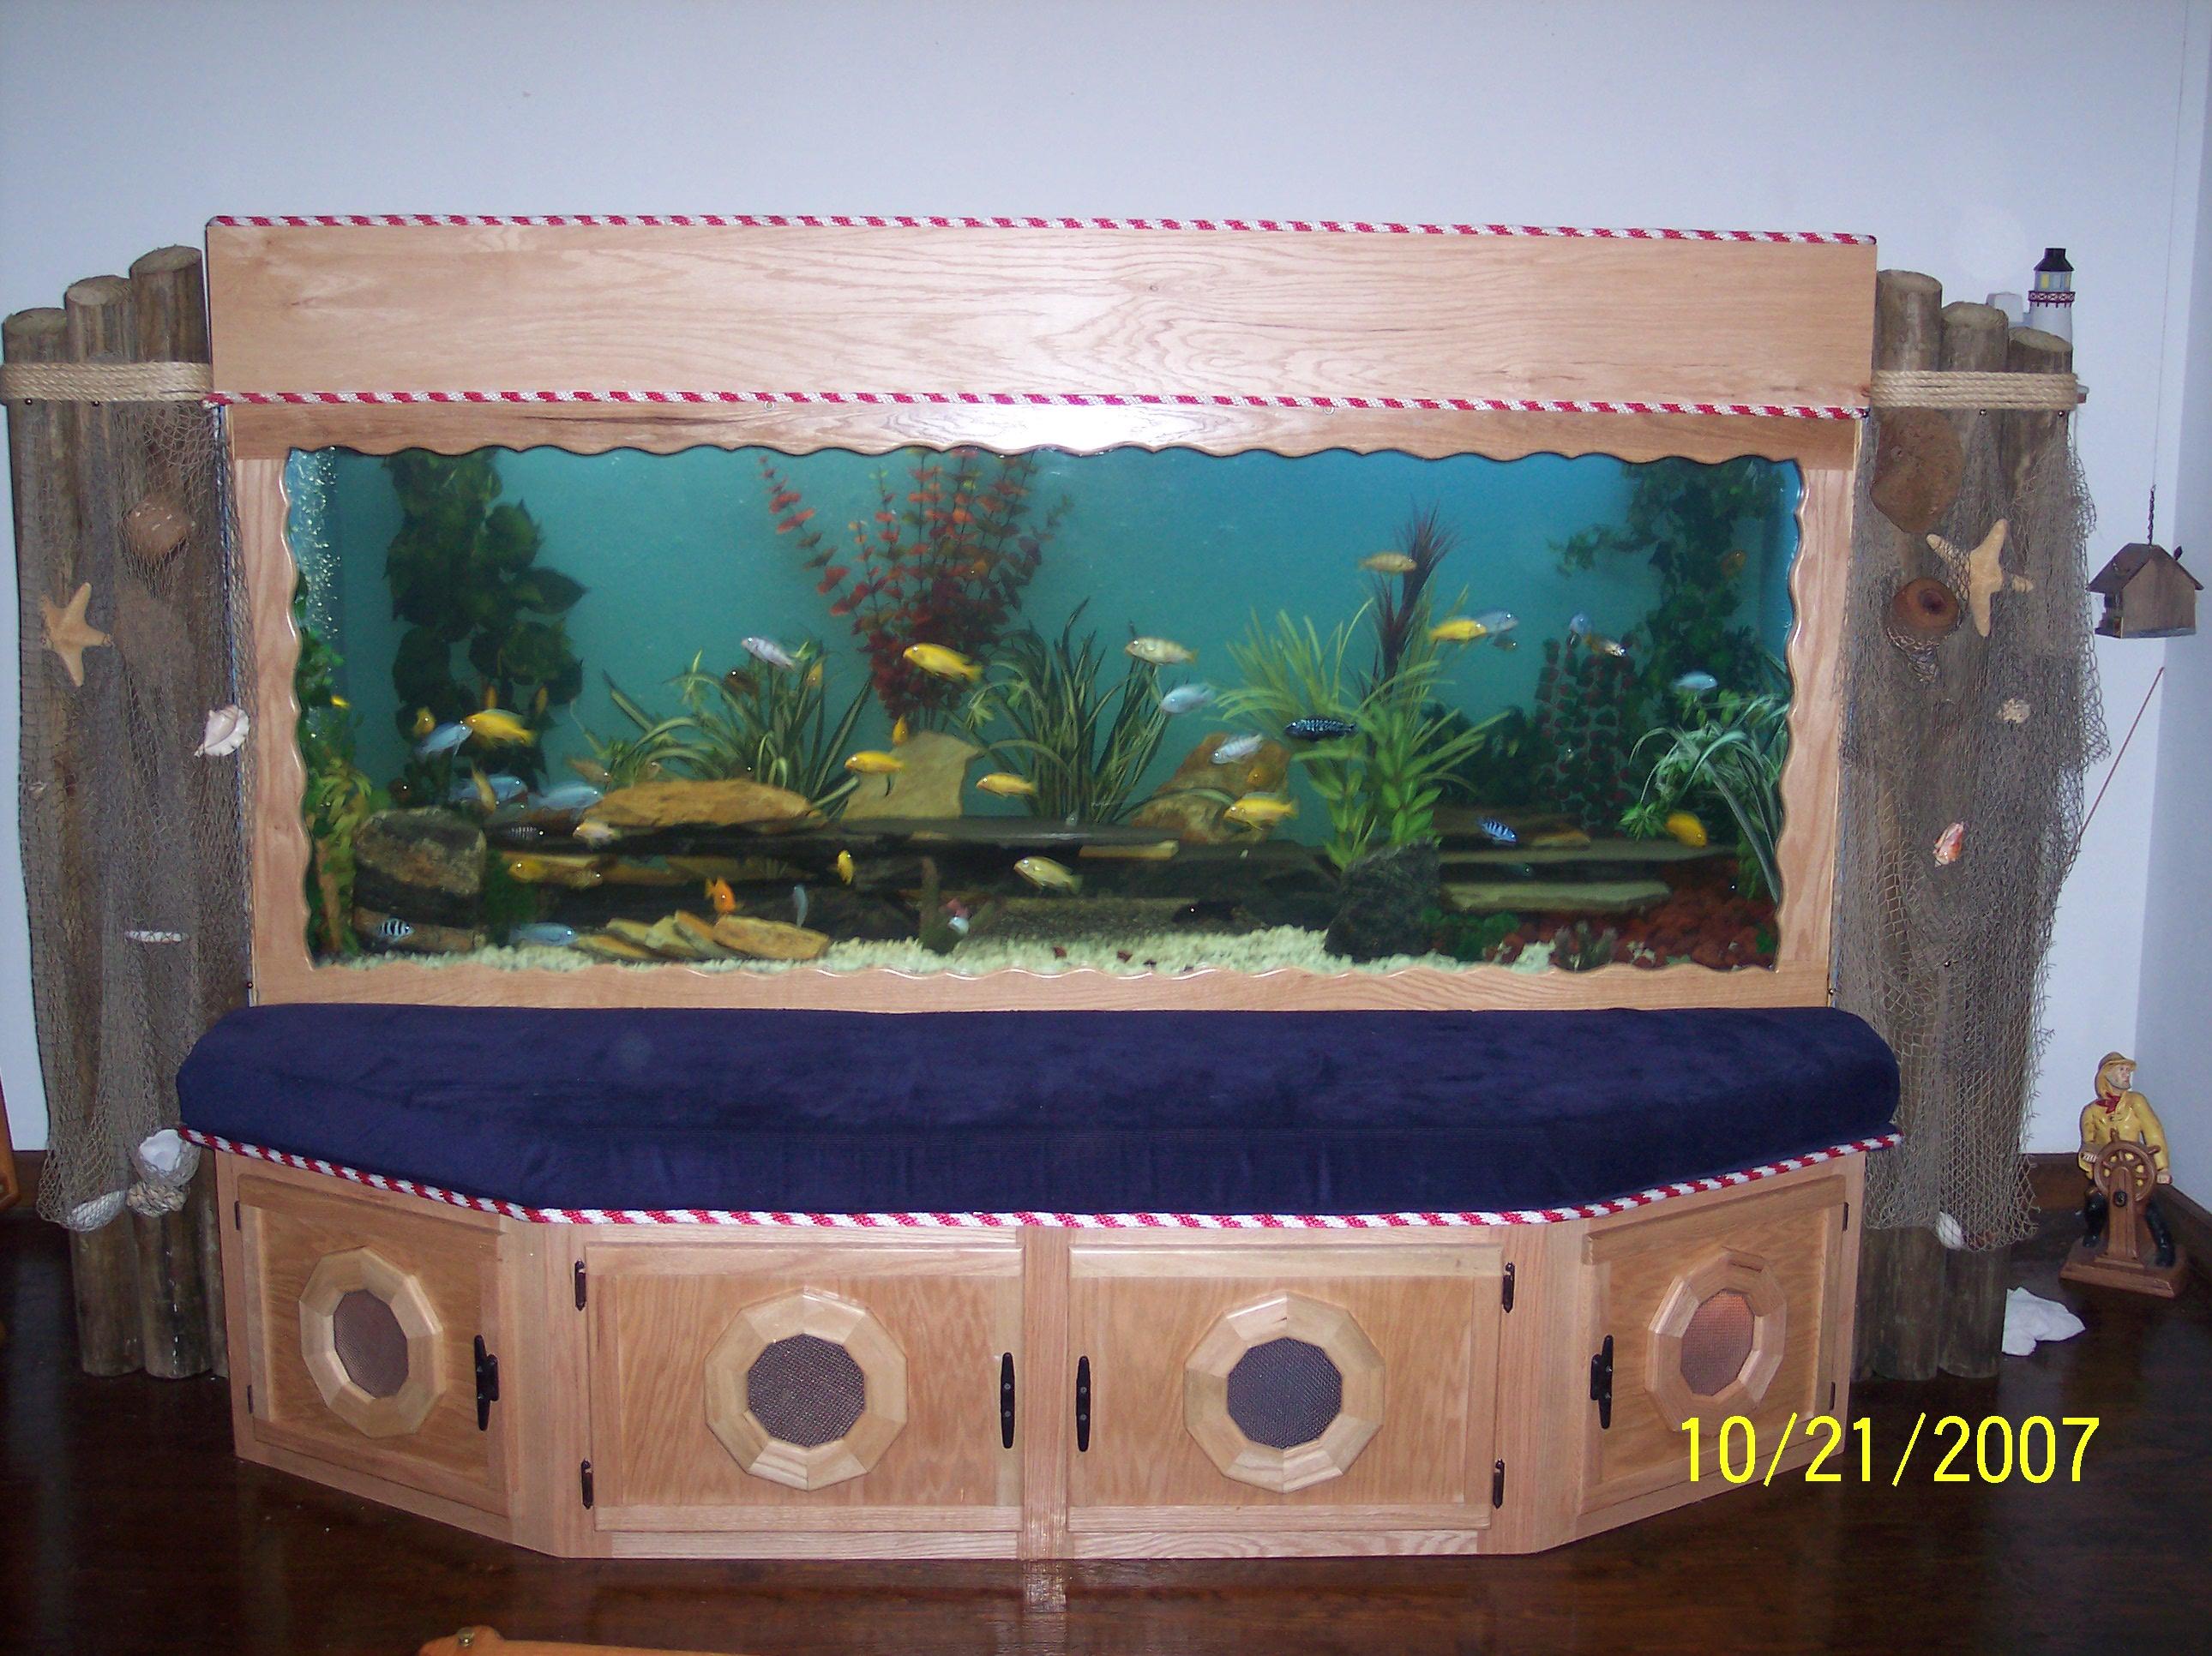 Coolest fish for freshwater aquarium - 25 Best Ideas About Big Fish Tanks On Pinterest Big Aquarium Amazing Fish Tanks And Tropical Fish Tanks